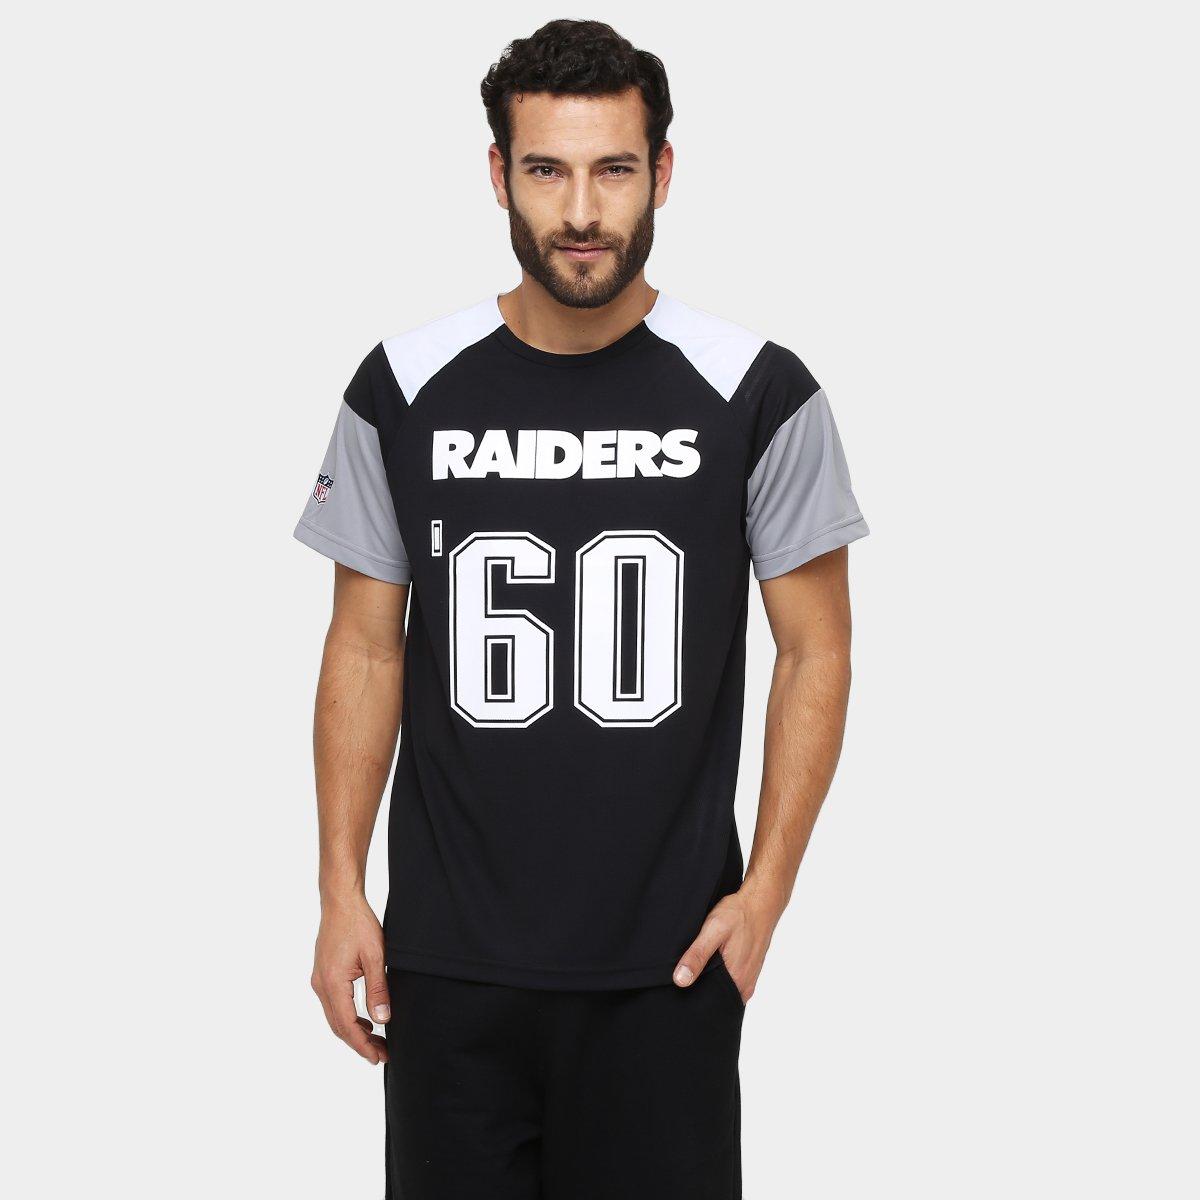 74ddc6844d118 Camiseta New Era NFL Raglan Recorte Oakland Raiders - Compre Agora ...